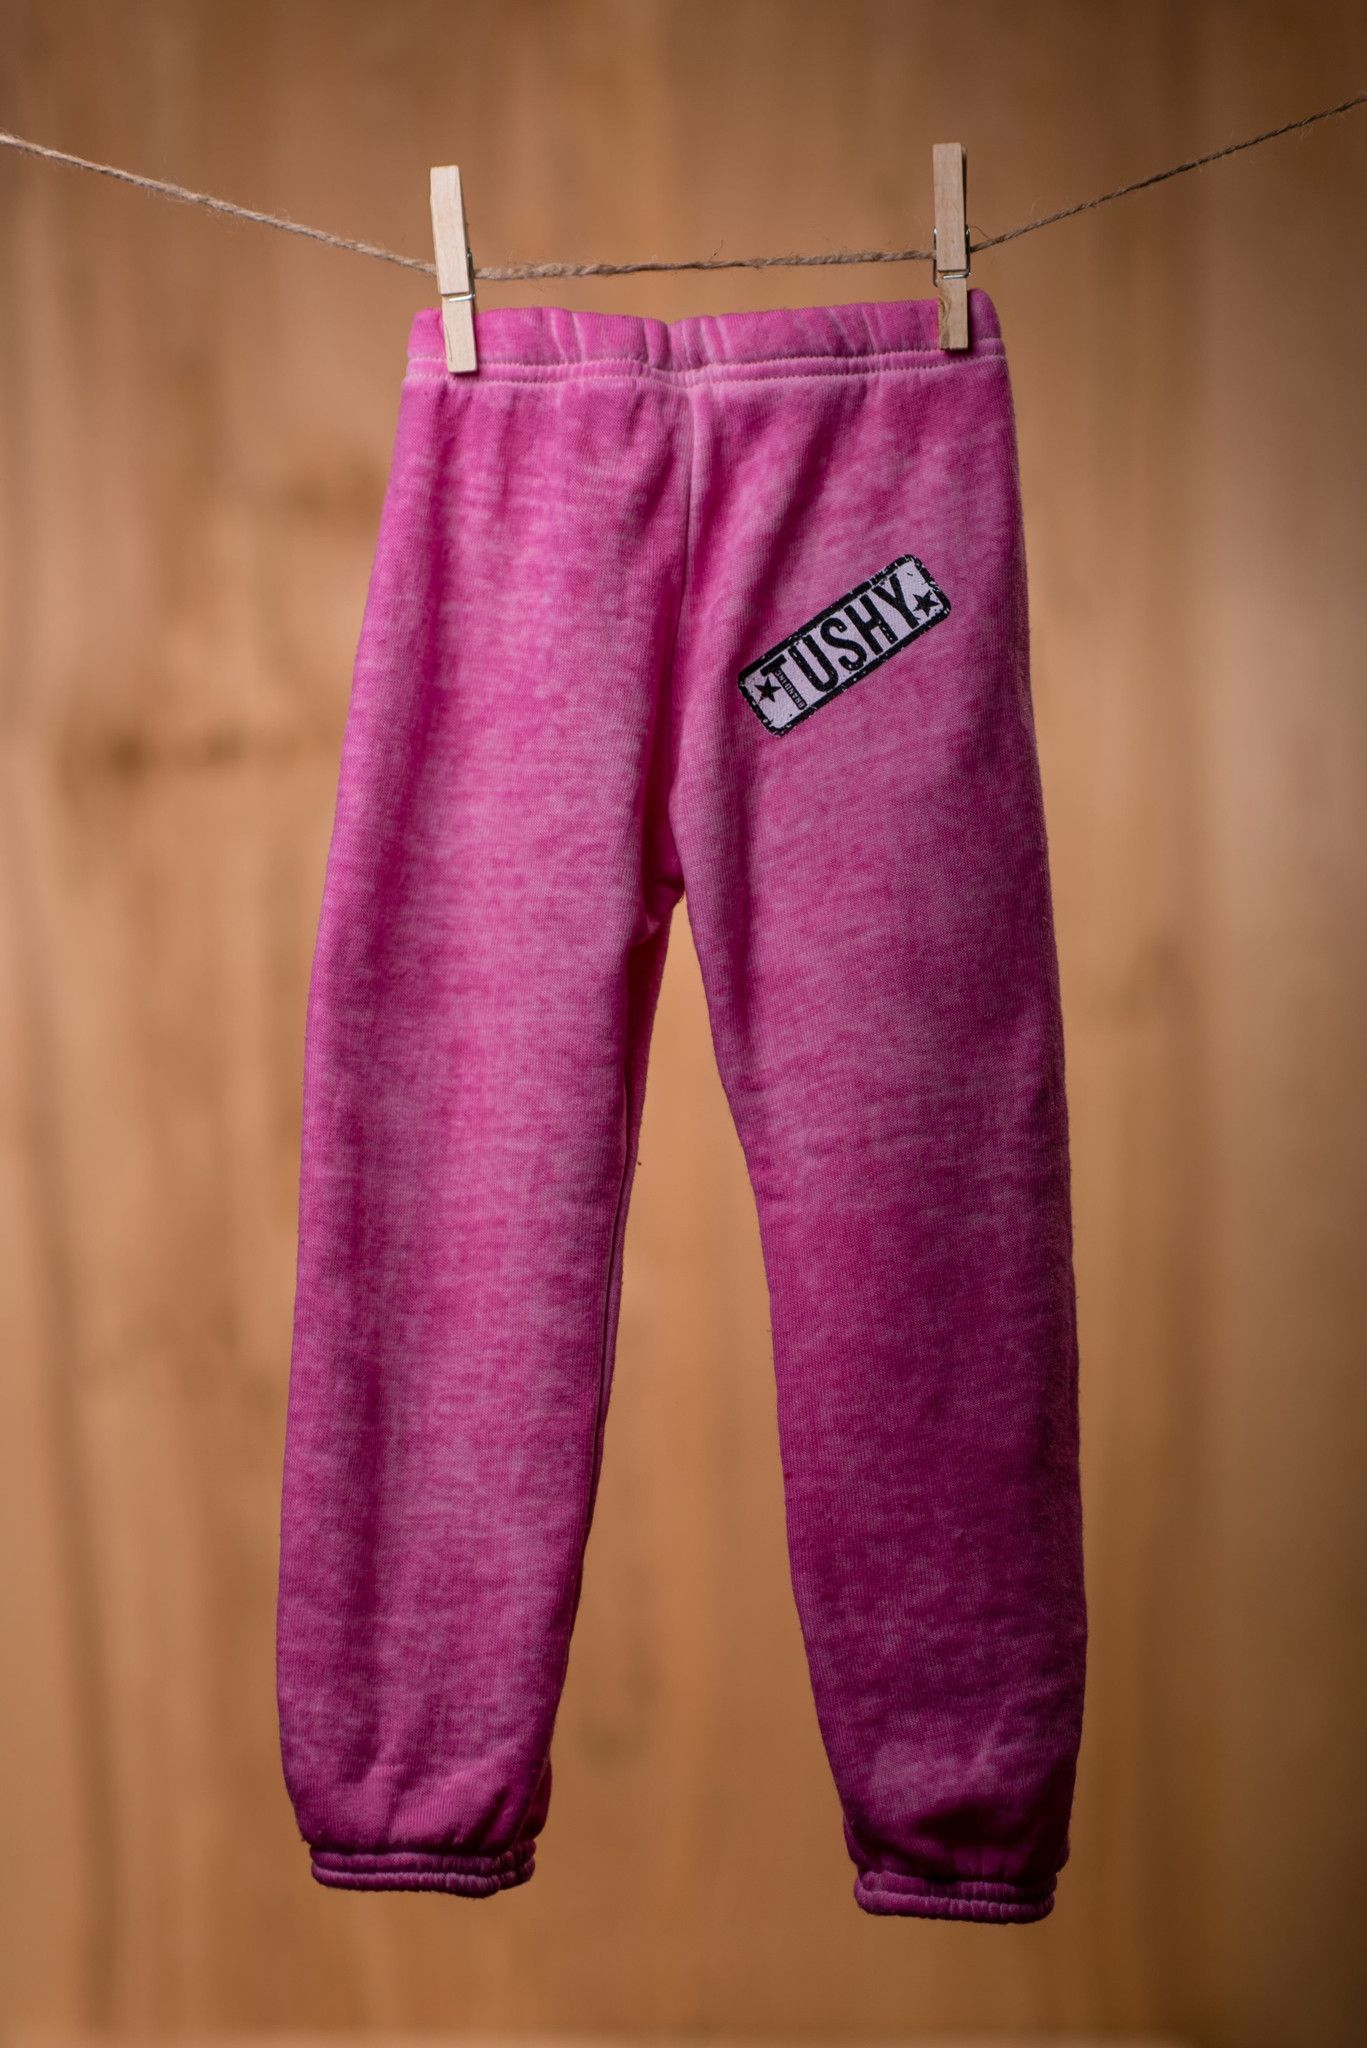 Destroyed, Pink Wash Fleece Sweatpant